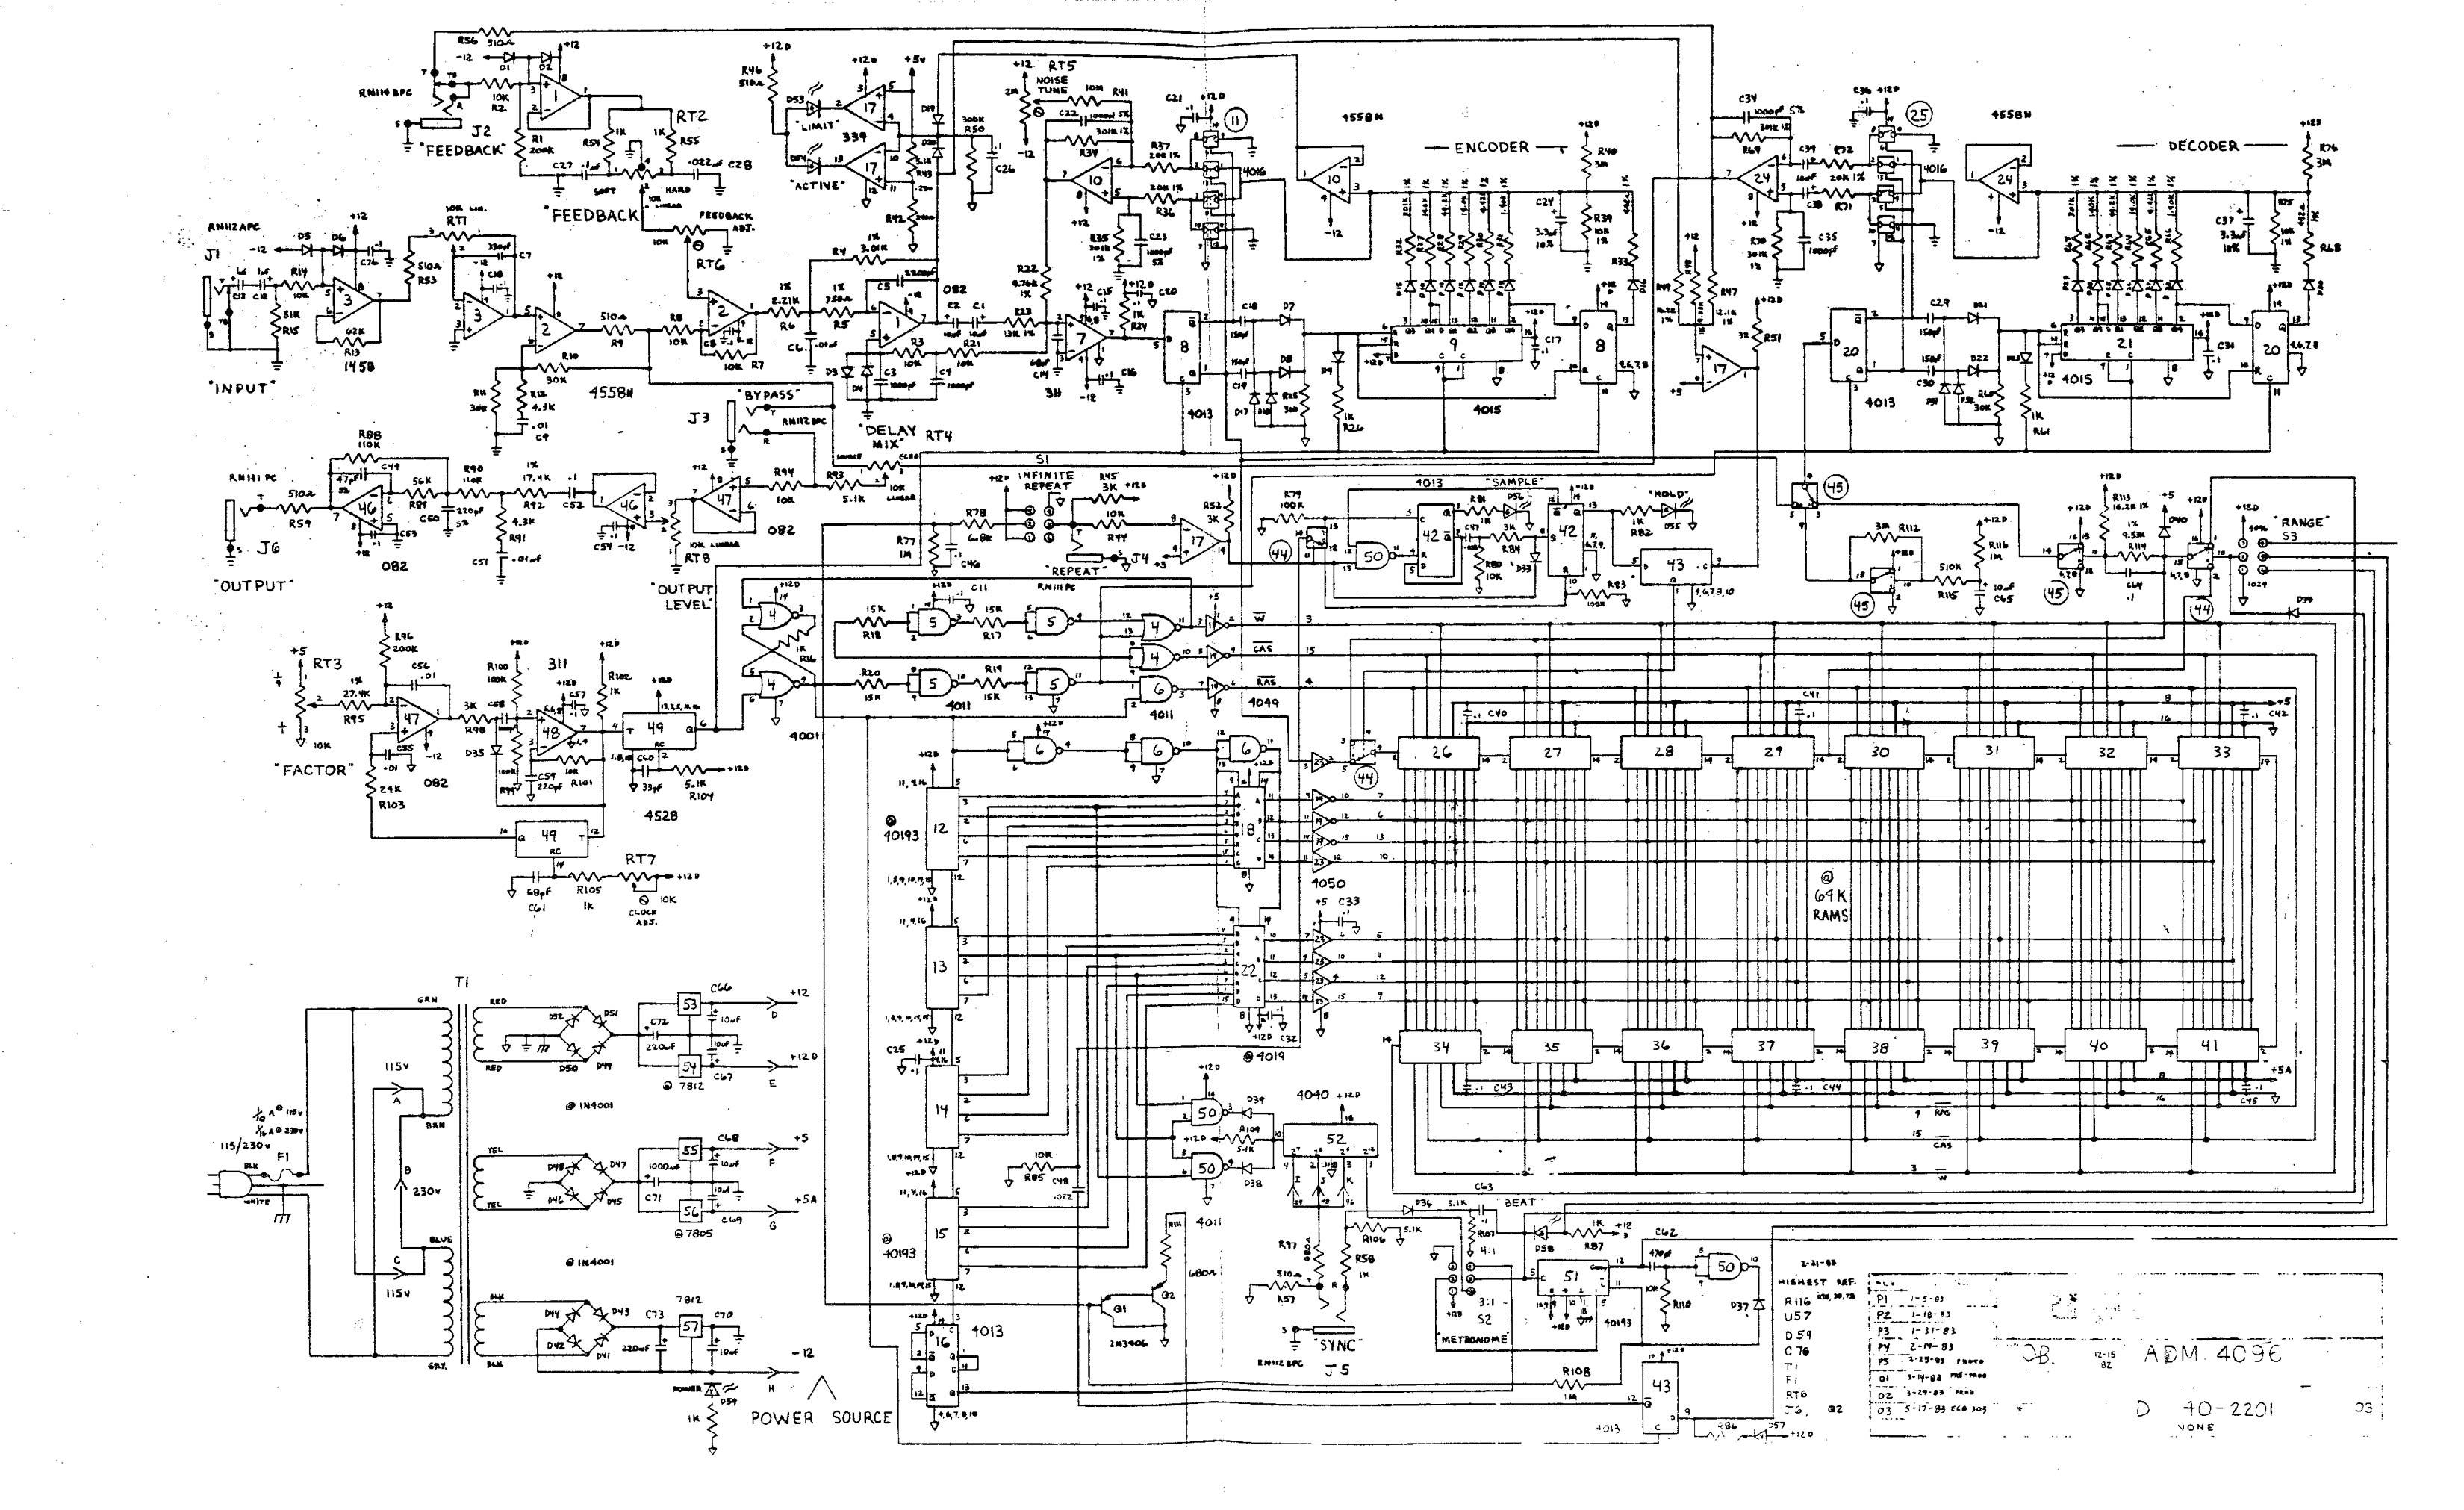 bn1studio   Bn1studio on alesis ra150 schematic, alesis sr-16 demo, alesis studio 32 schematic,